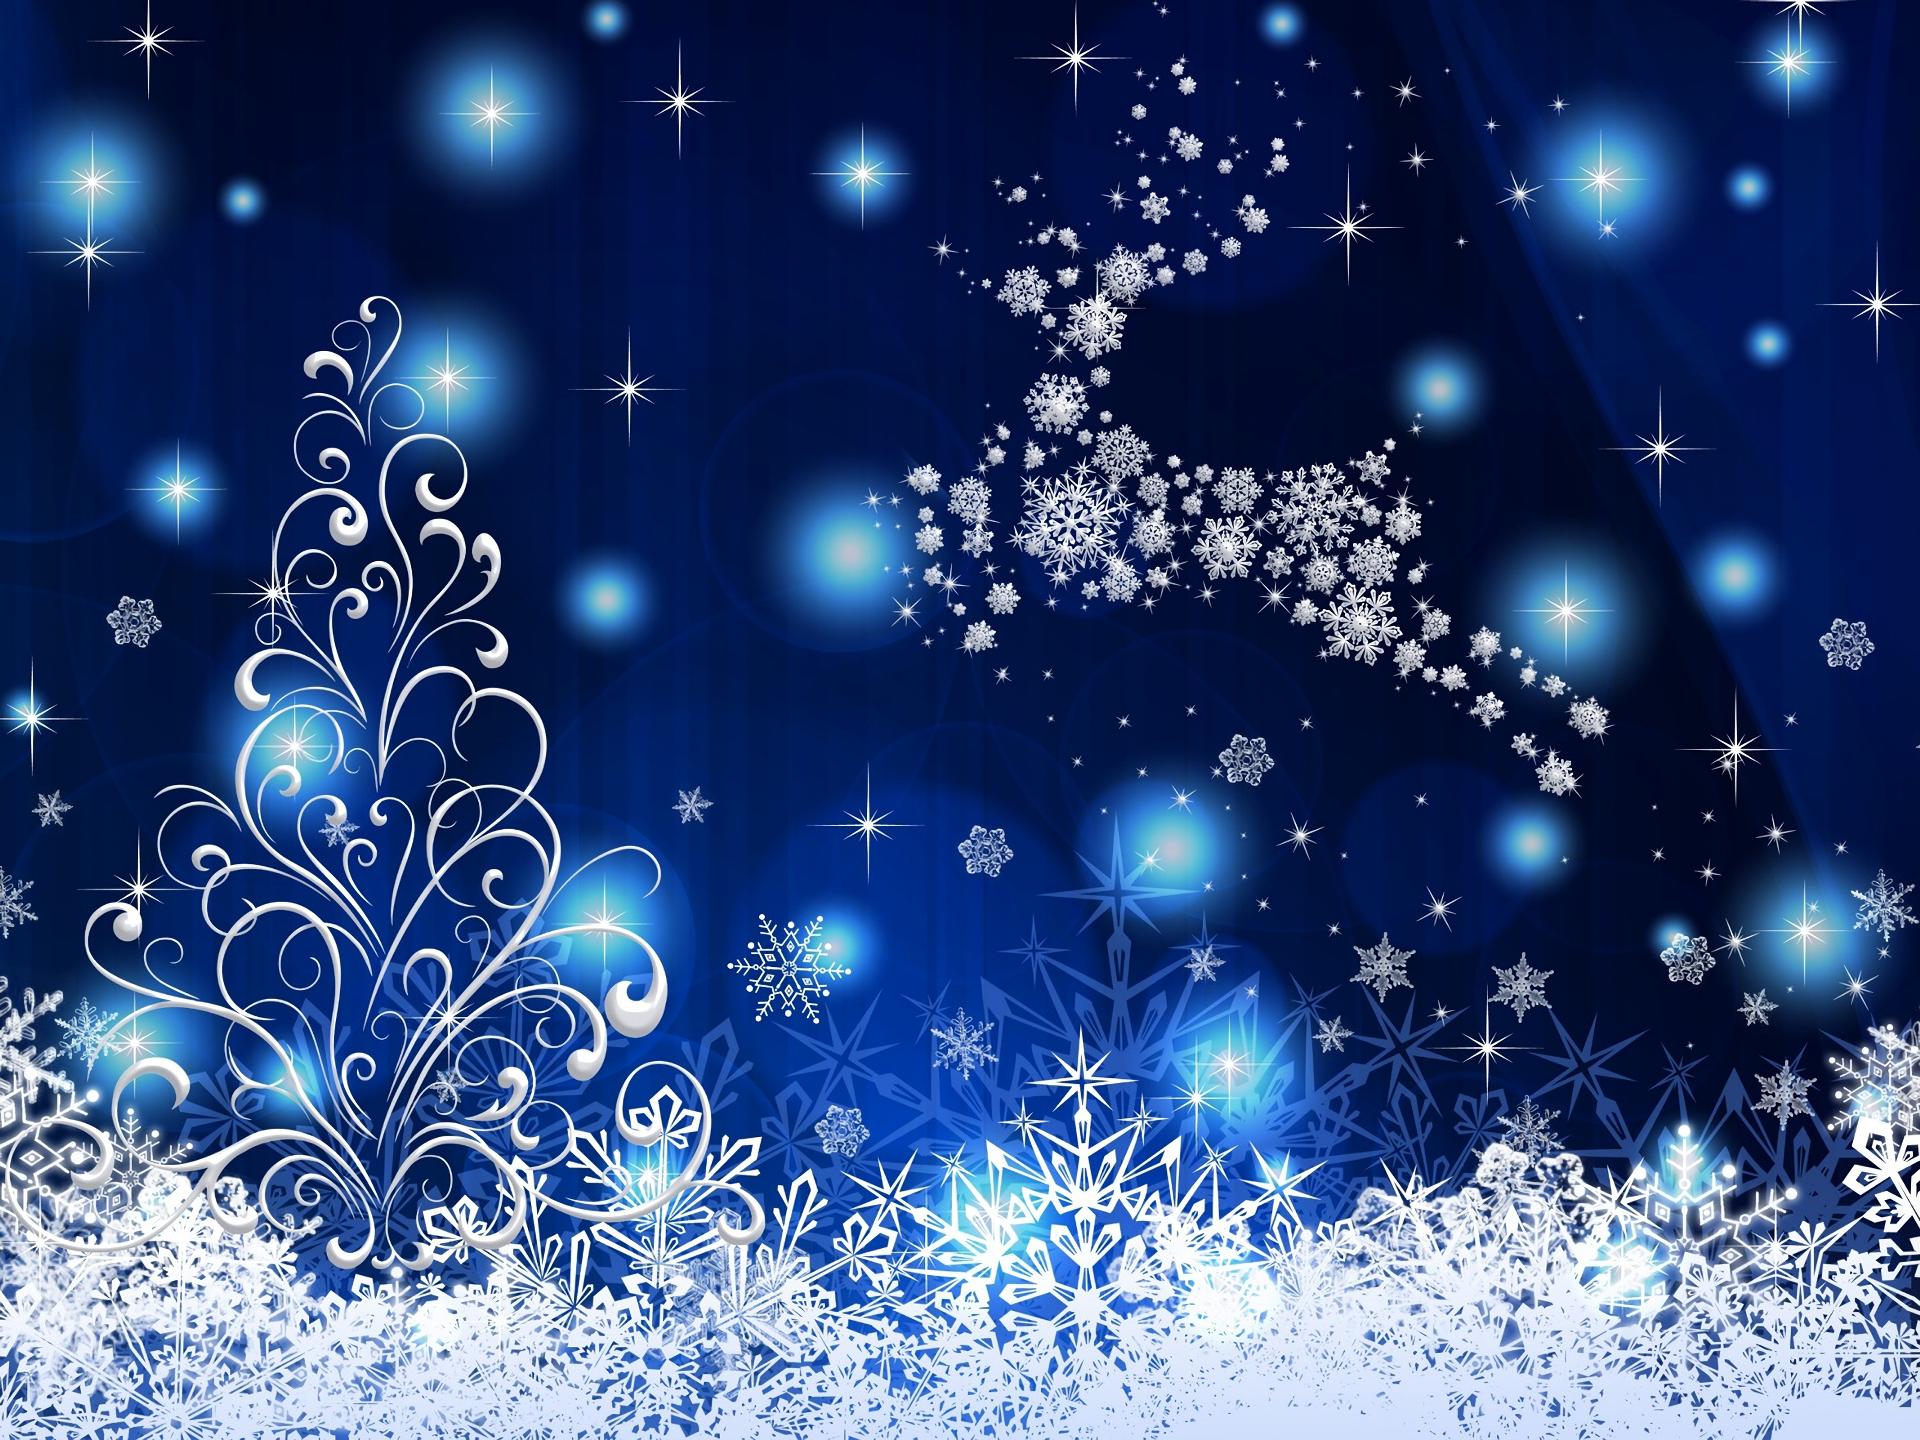 Blue Christmas Tree Forum Avatar: Christmas Tree And Reindeer HD Wallpaper